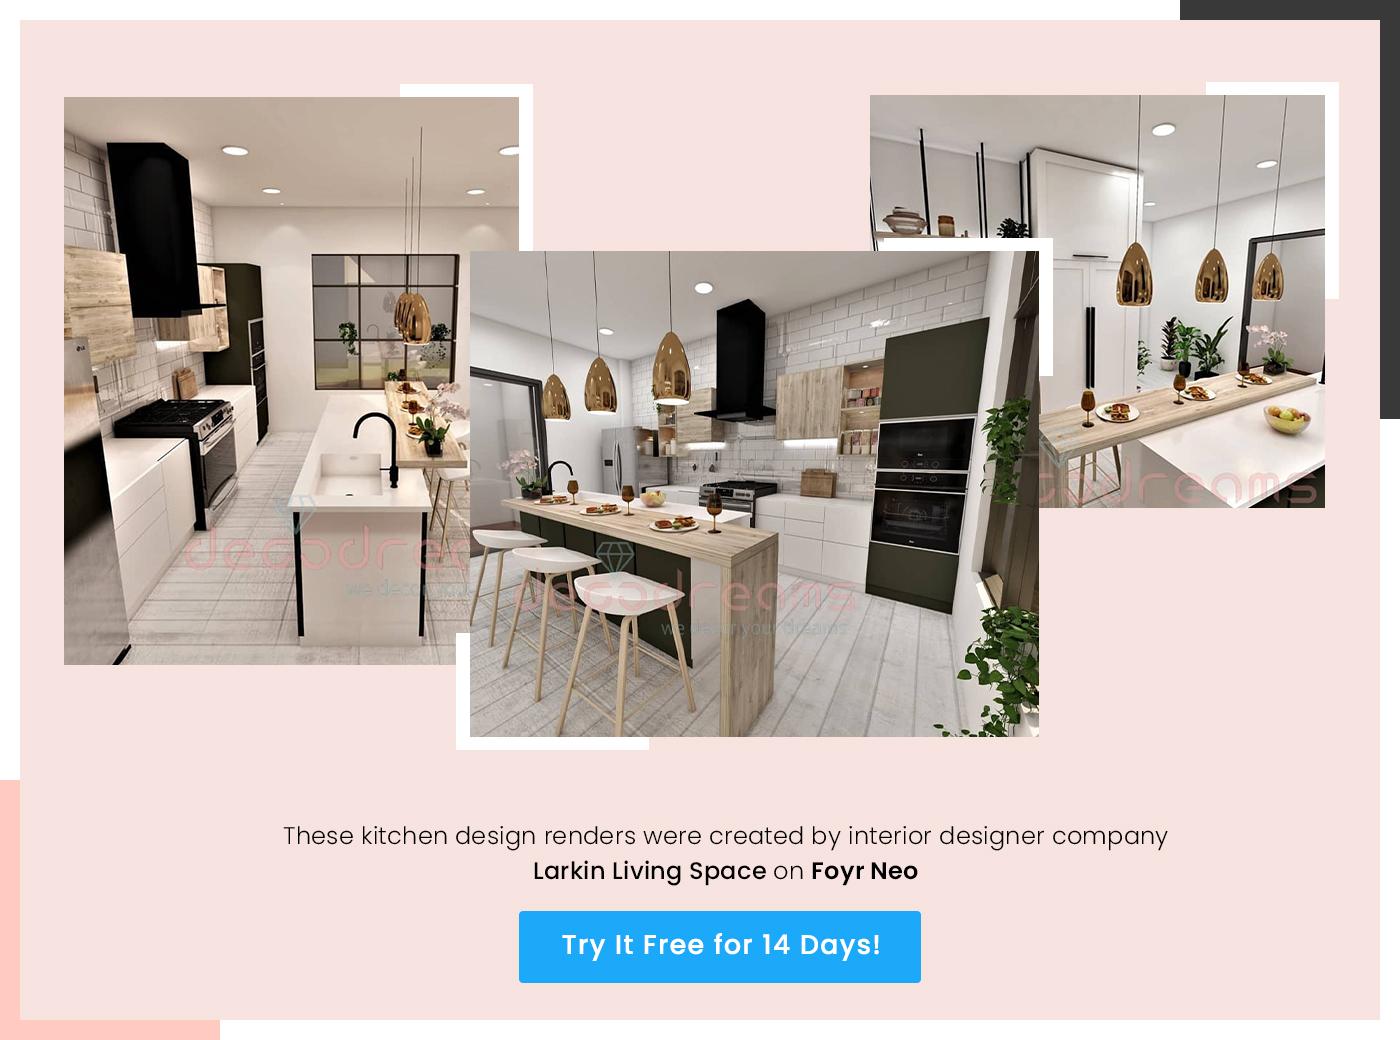 kitchen design render created by larkin living space